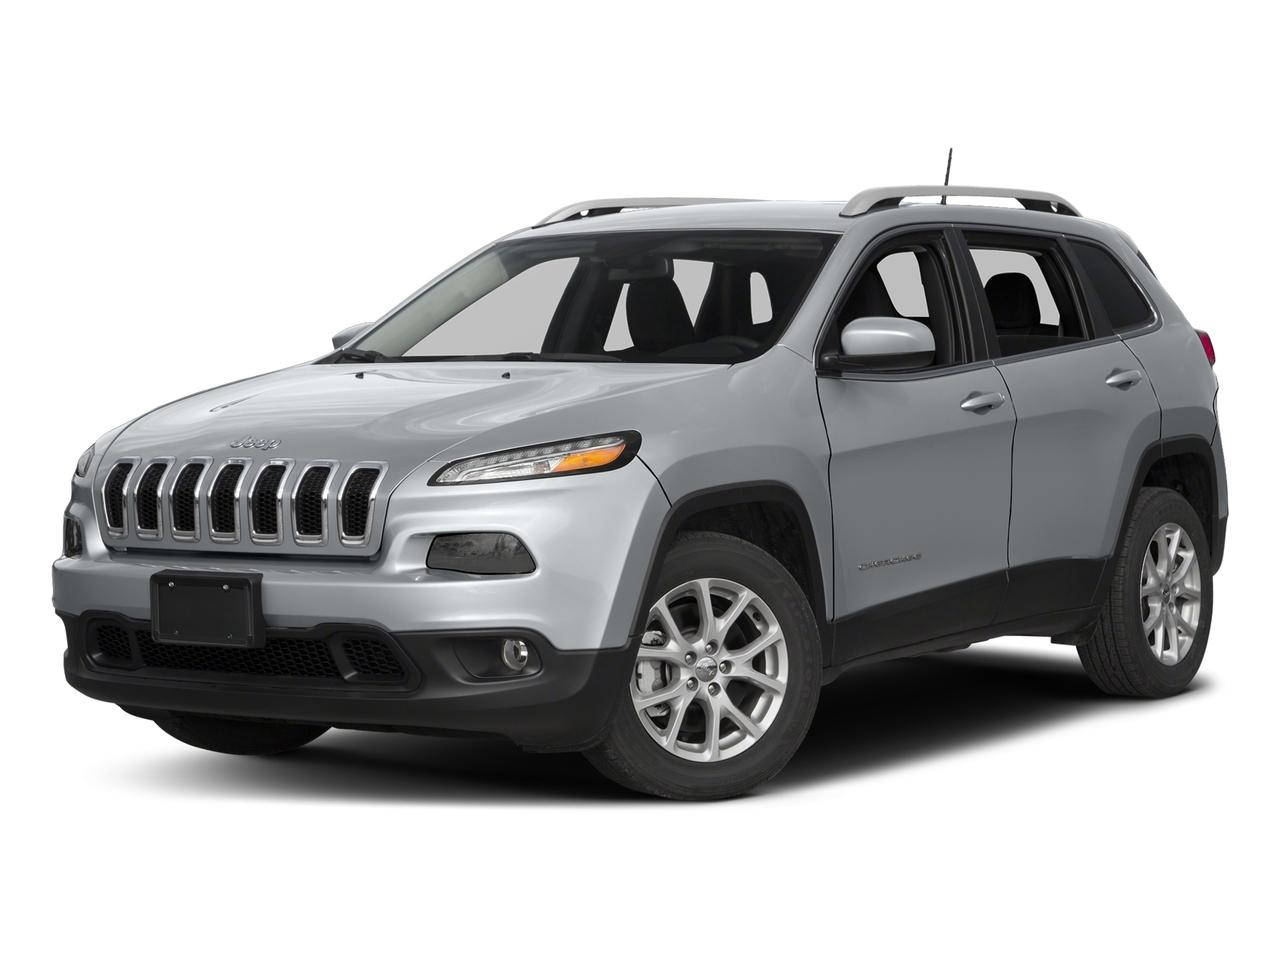 2017 Jeep Cherokee Vehicle Photo in Tucson, AZ 85712